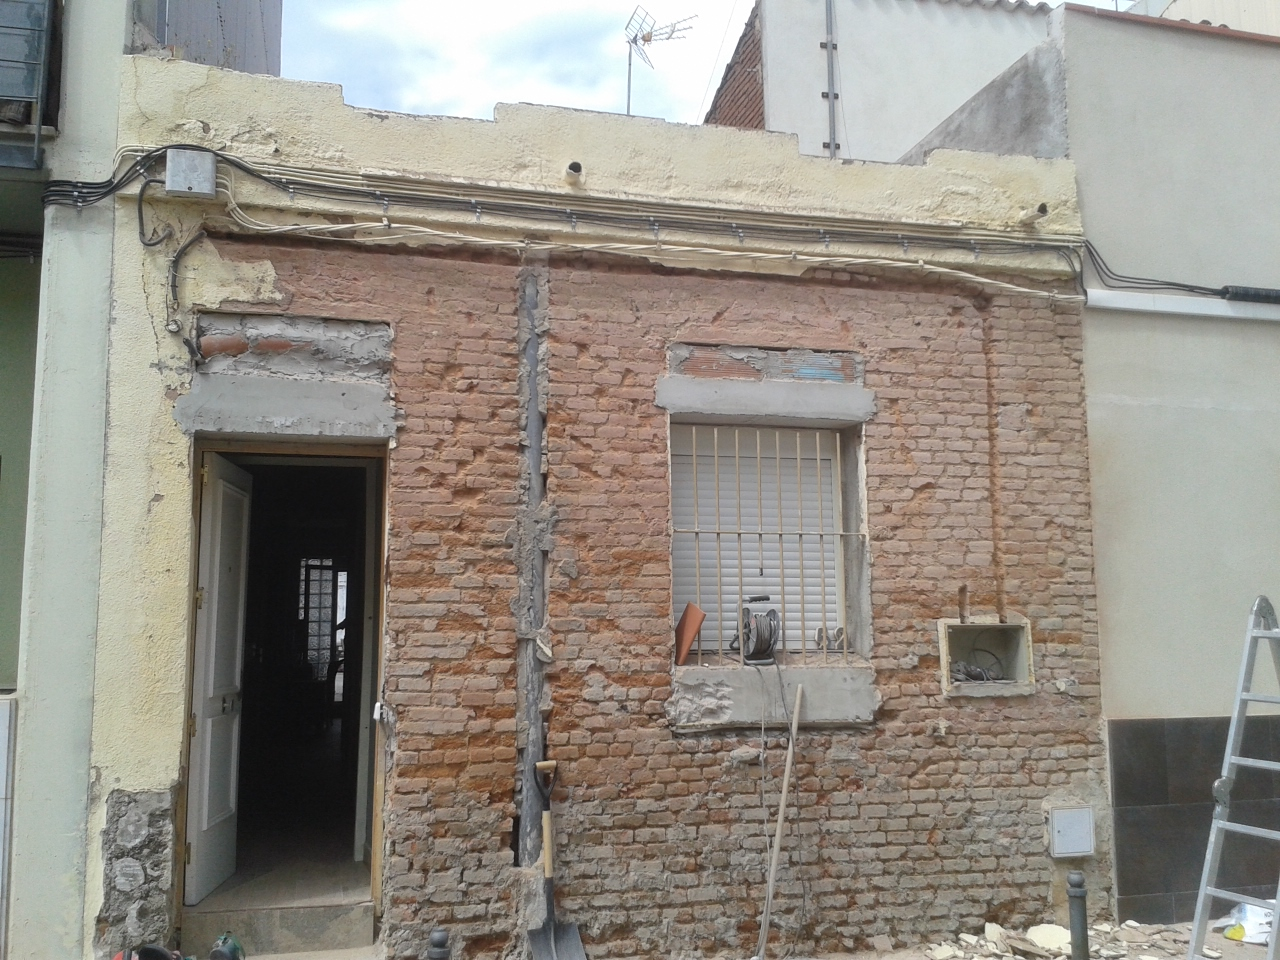 Reforma Barata ~ BARCELONA Arquitectura+Construcción Serviciosdepaleta blogspot com 650394454 Reforma+barata